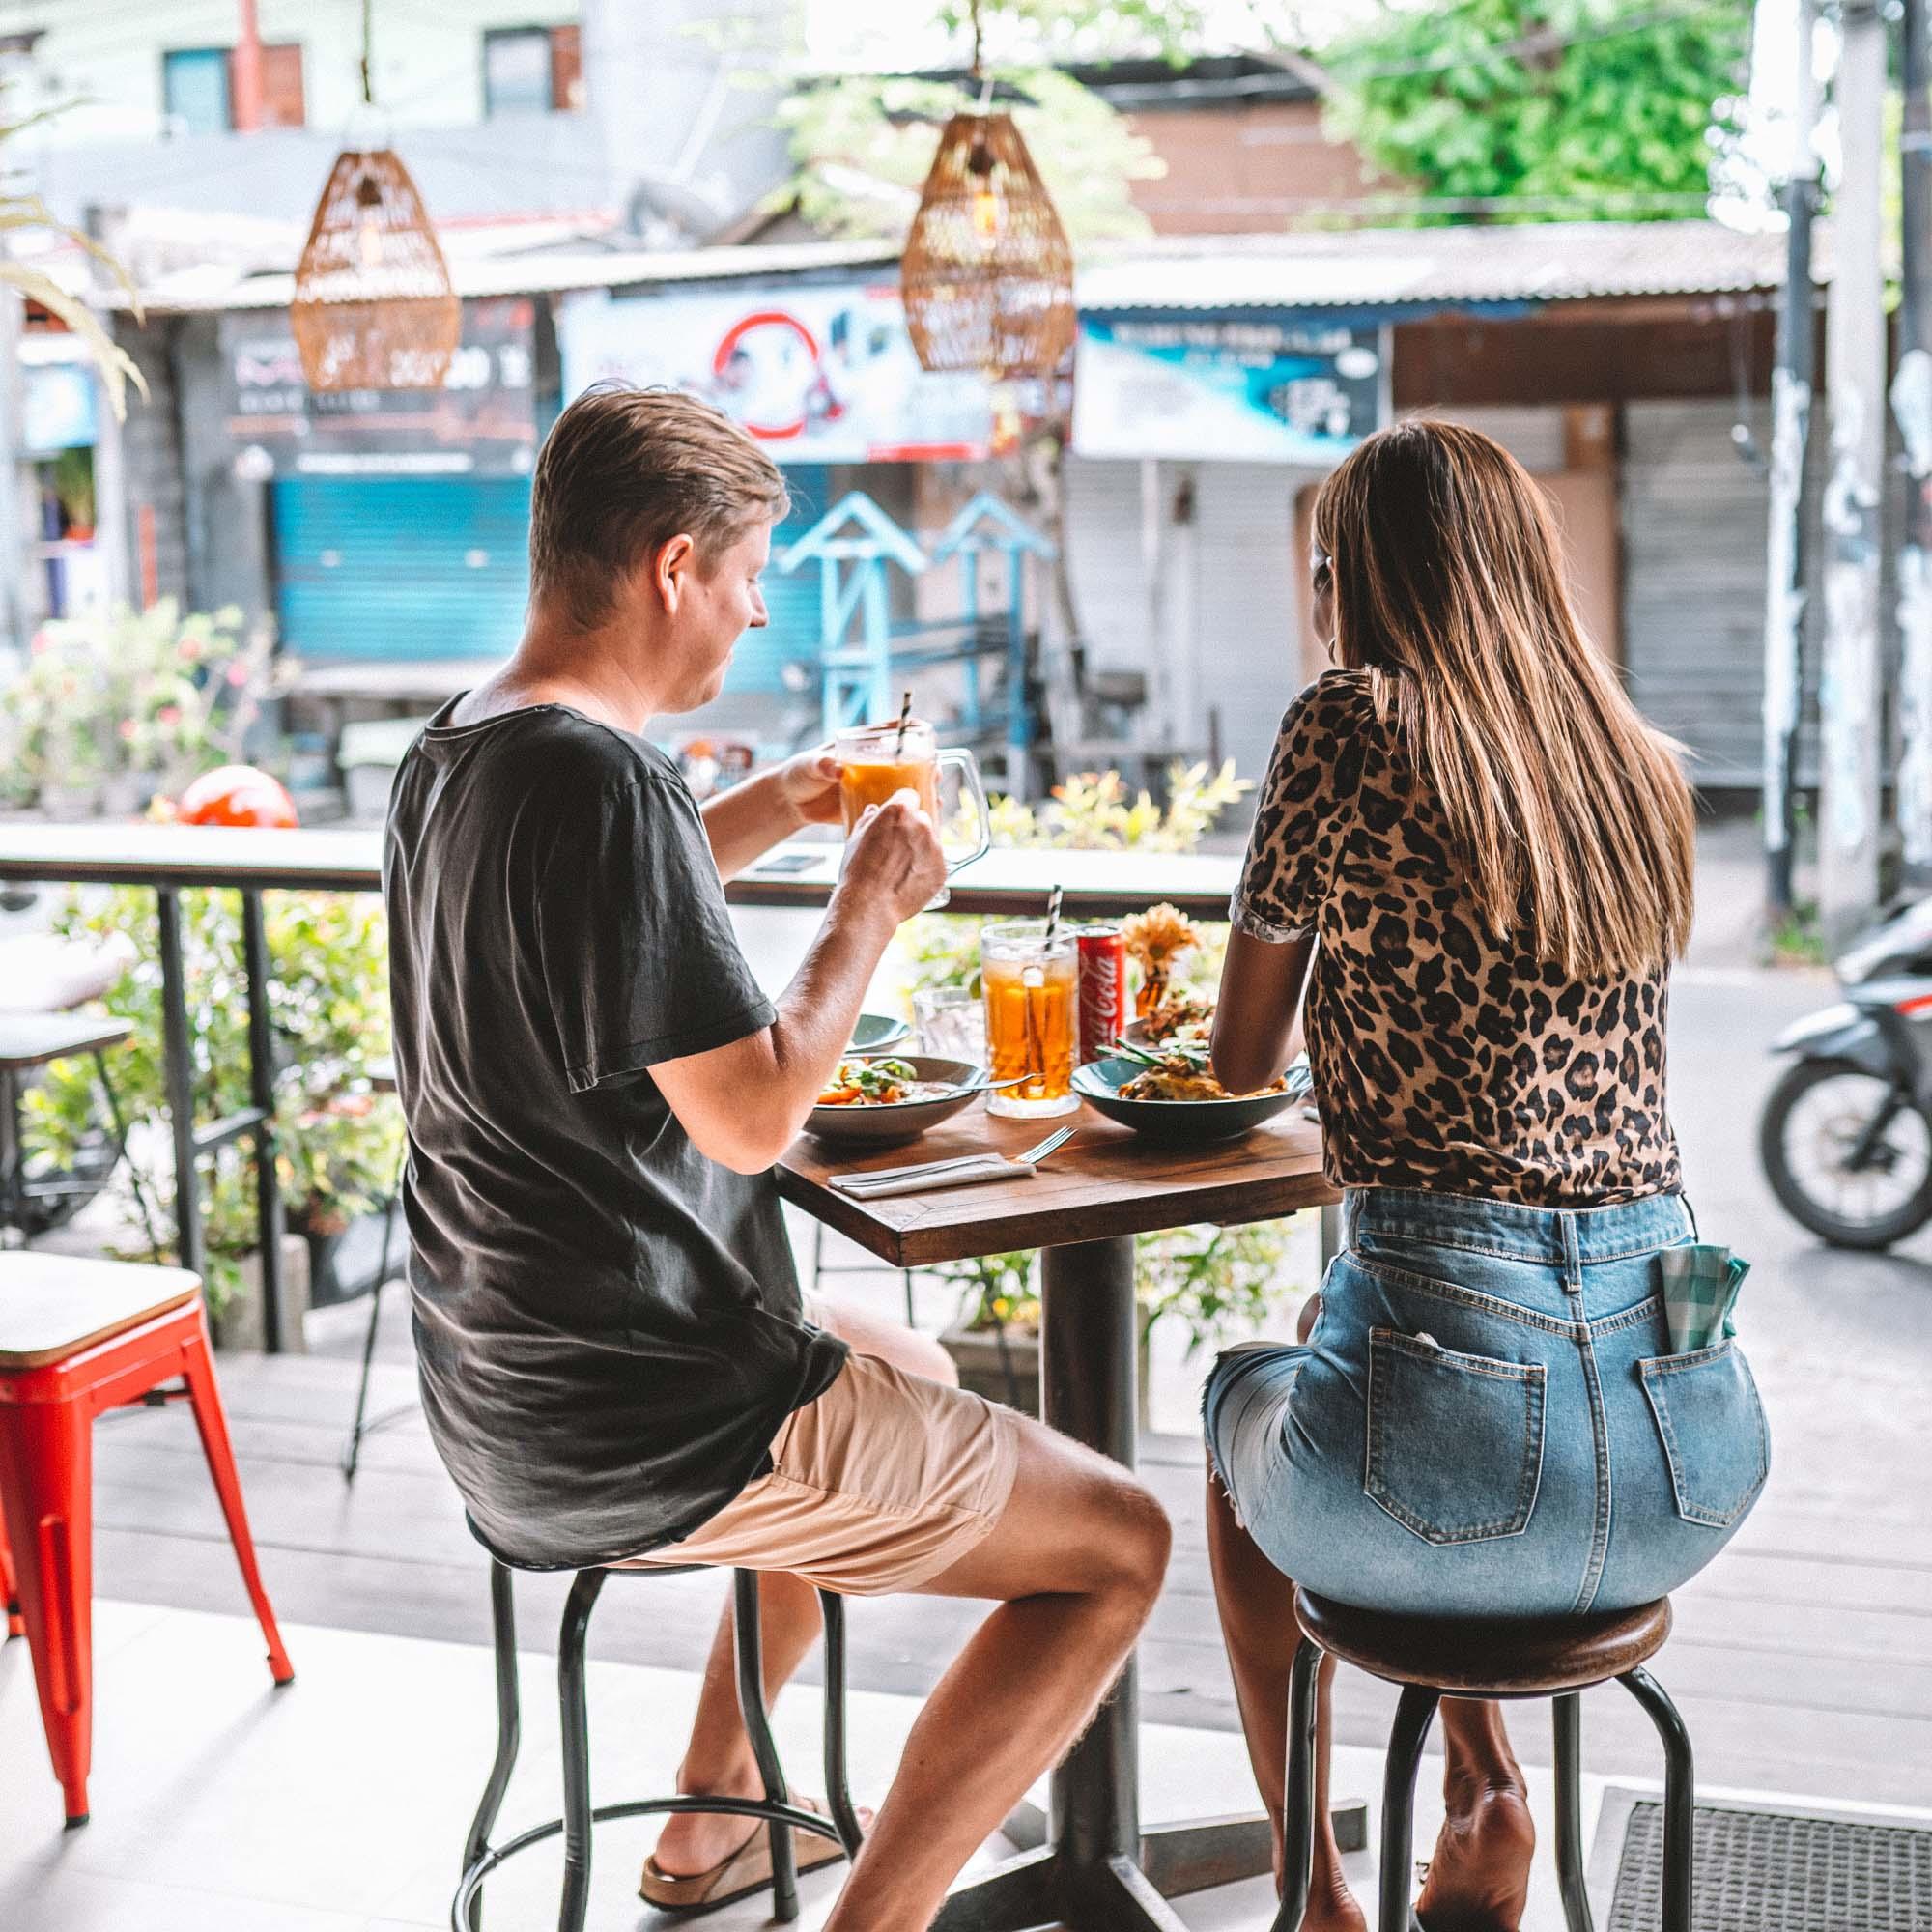 keira-mason-bangkok-hustle-people-at-cafe-table.jpg